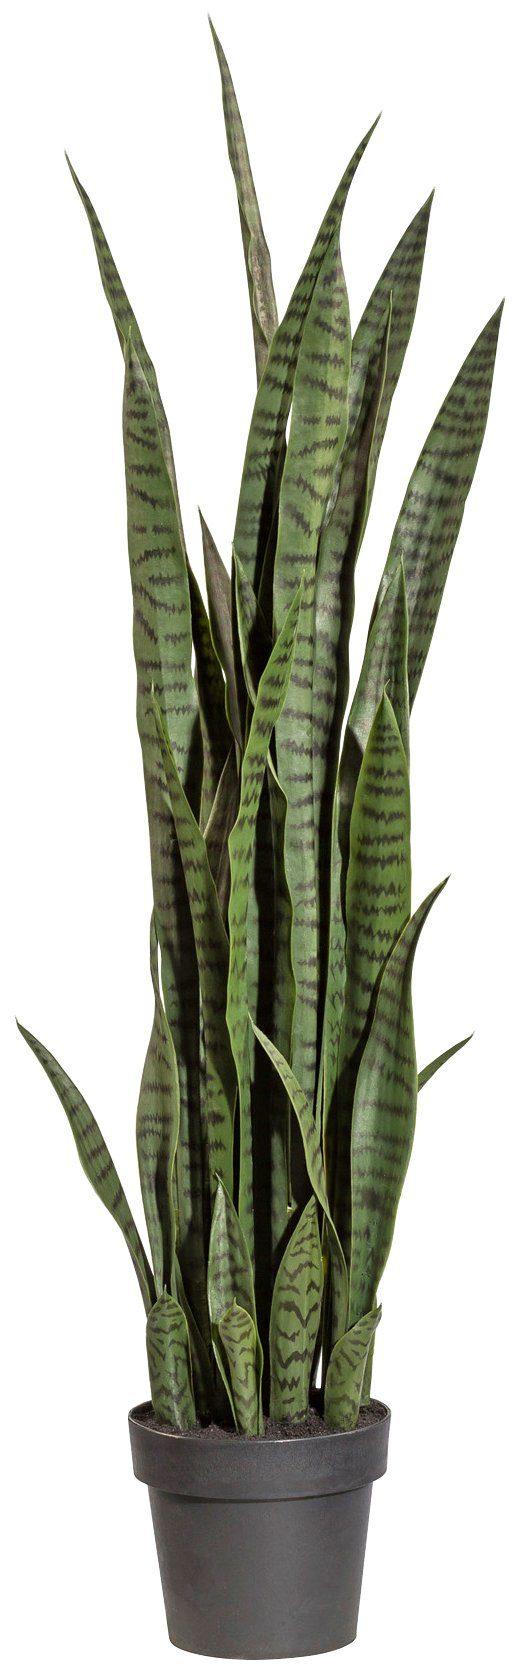 Kunstpflanze »Sanseveria«, im Kunststofftopf, H: 120 cm